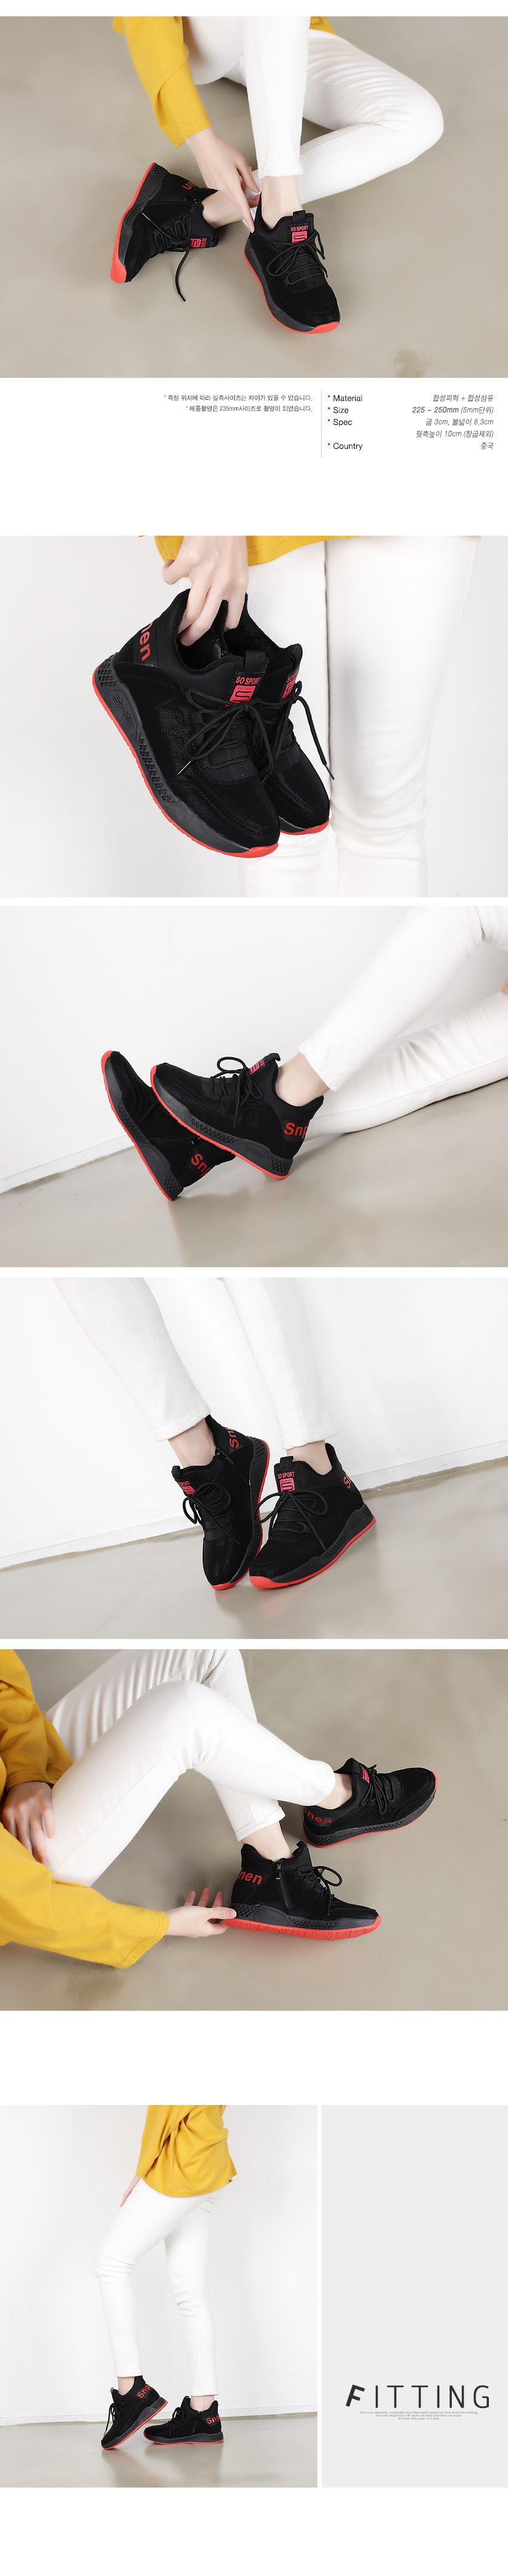 WS-6887 여자 털안감 스니커즈 털운동화 겨울 신발 - 더보이더걸, 52,600원, 운동화/슬립온, 운동화